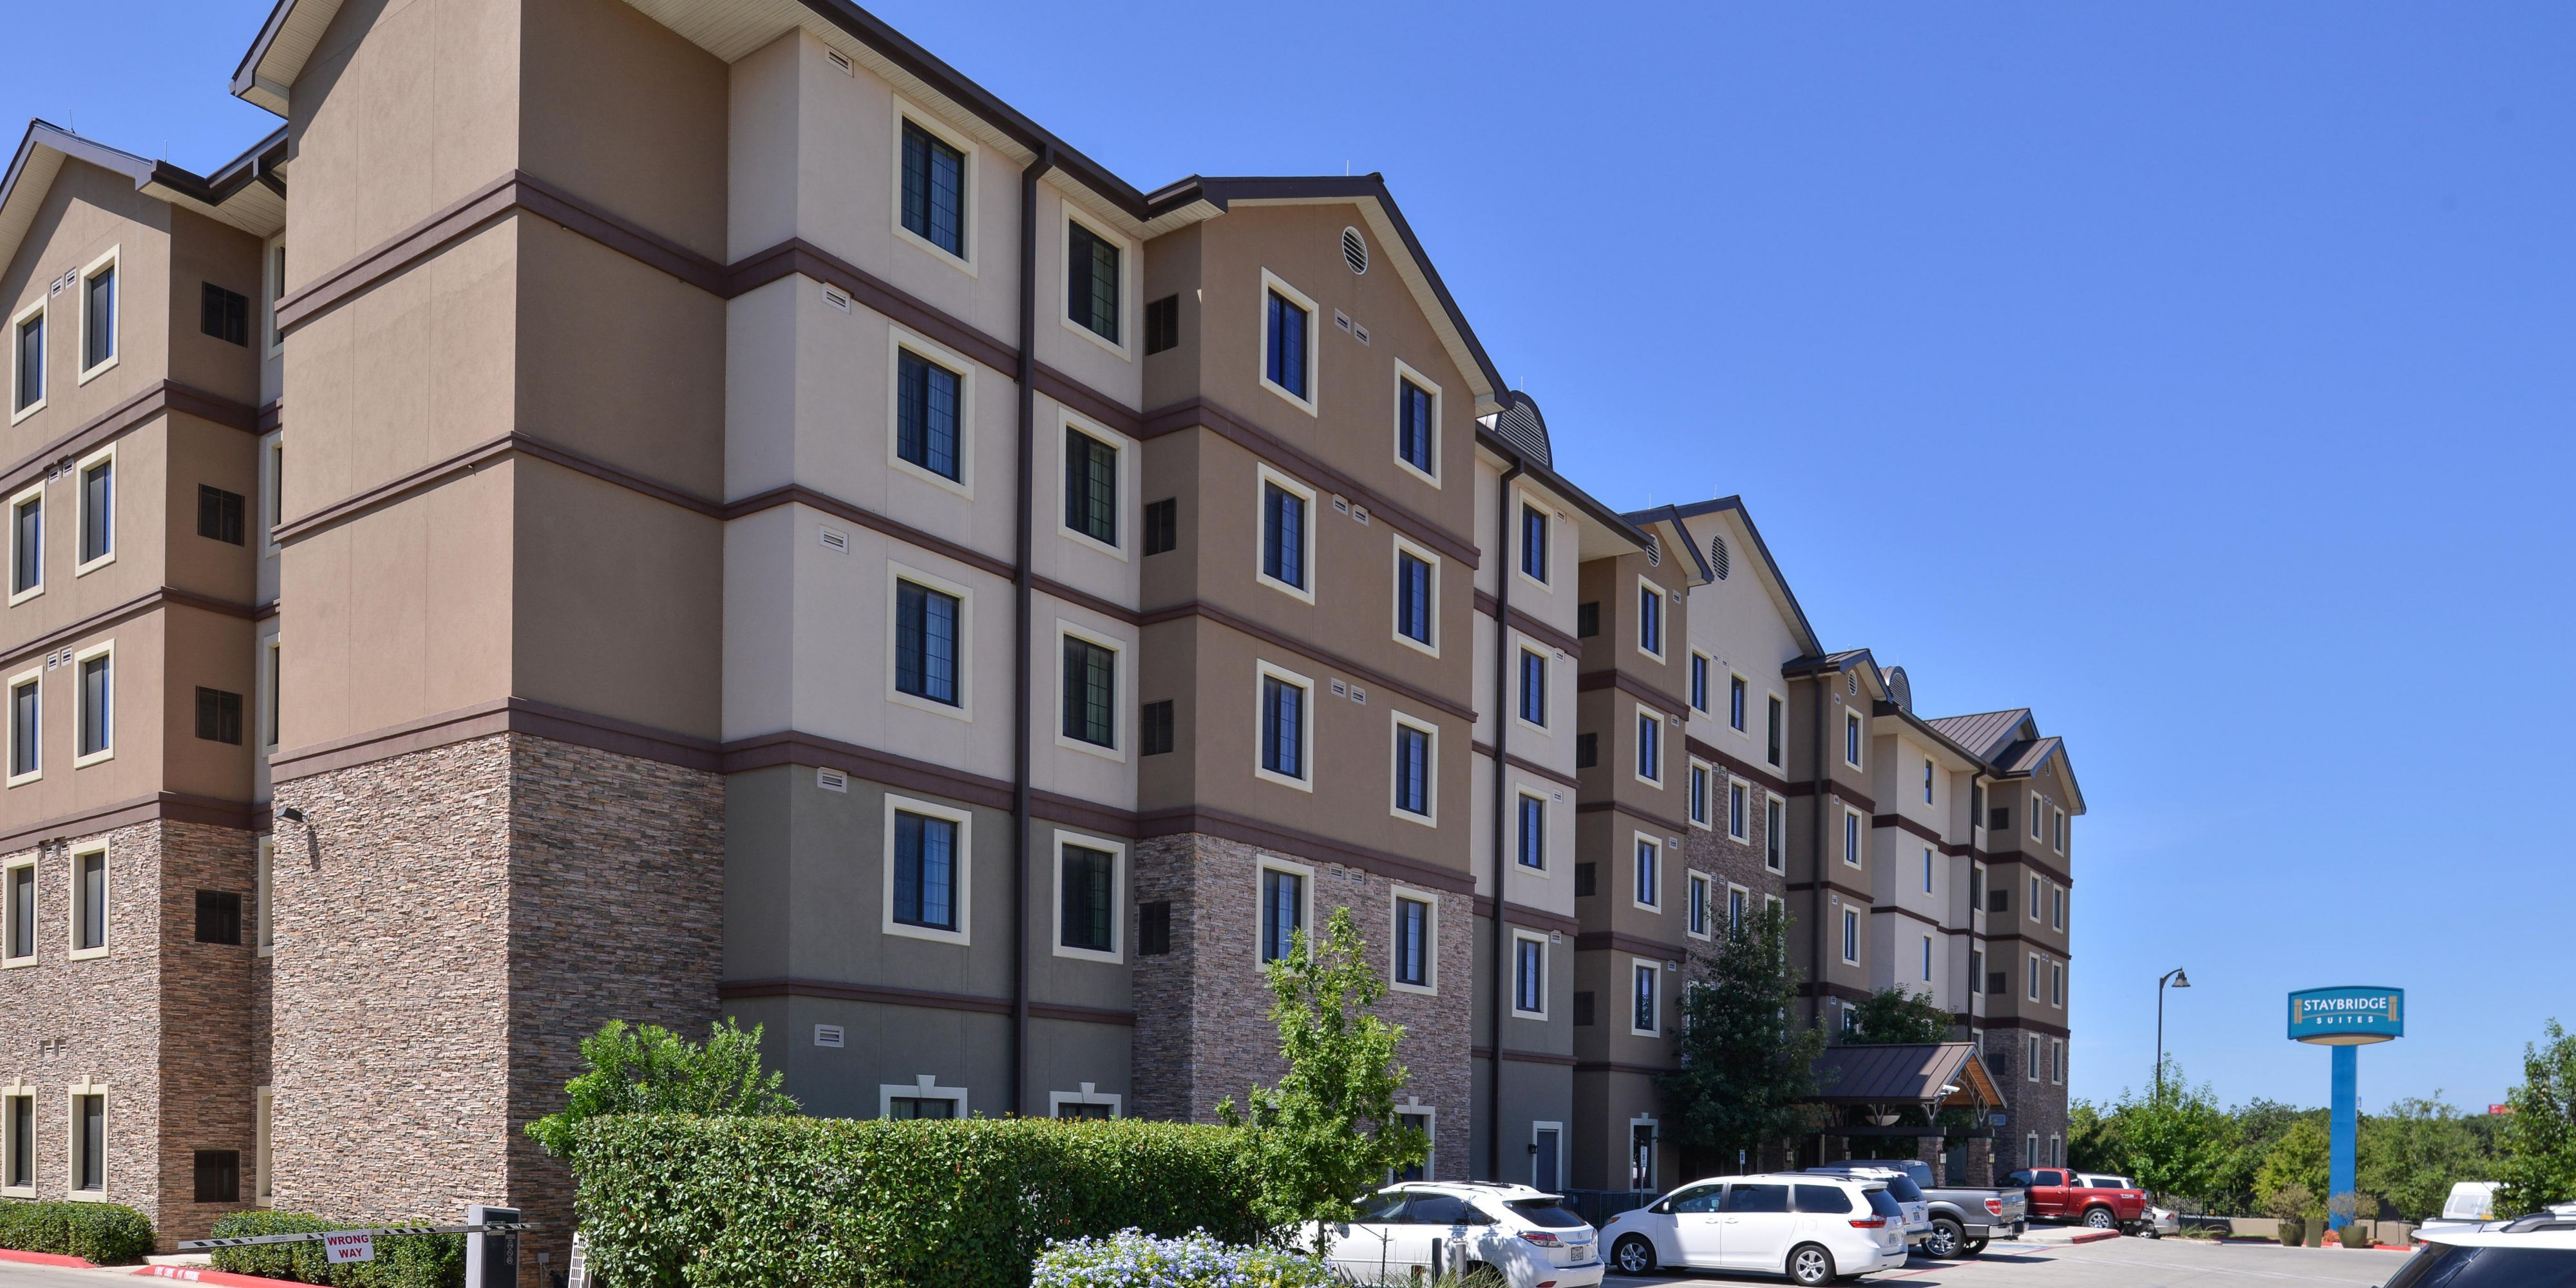 Staybridge Suites San Antonio - Stone Oak image 0